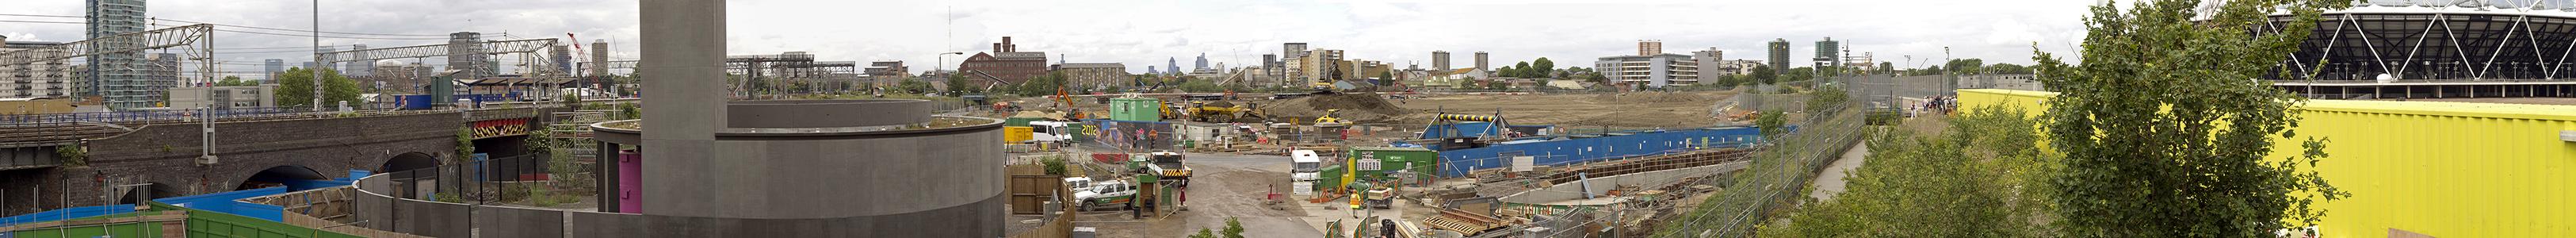 London Olympiapark (Olympic Park)